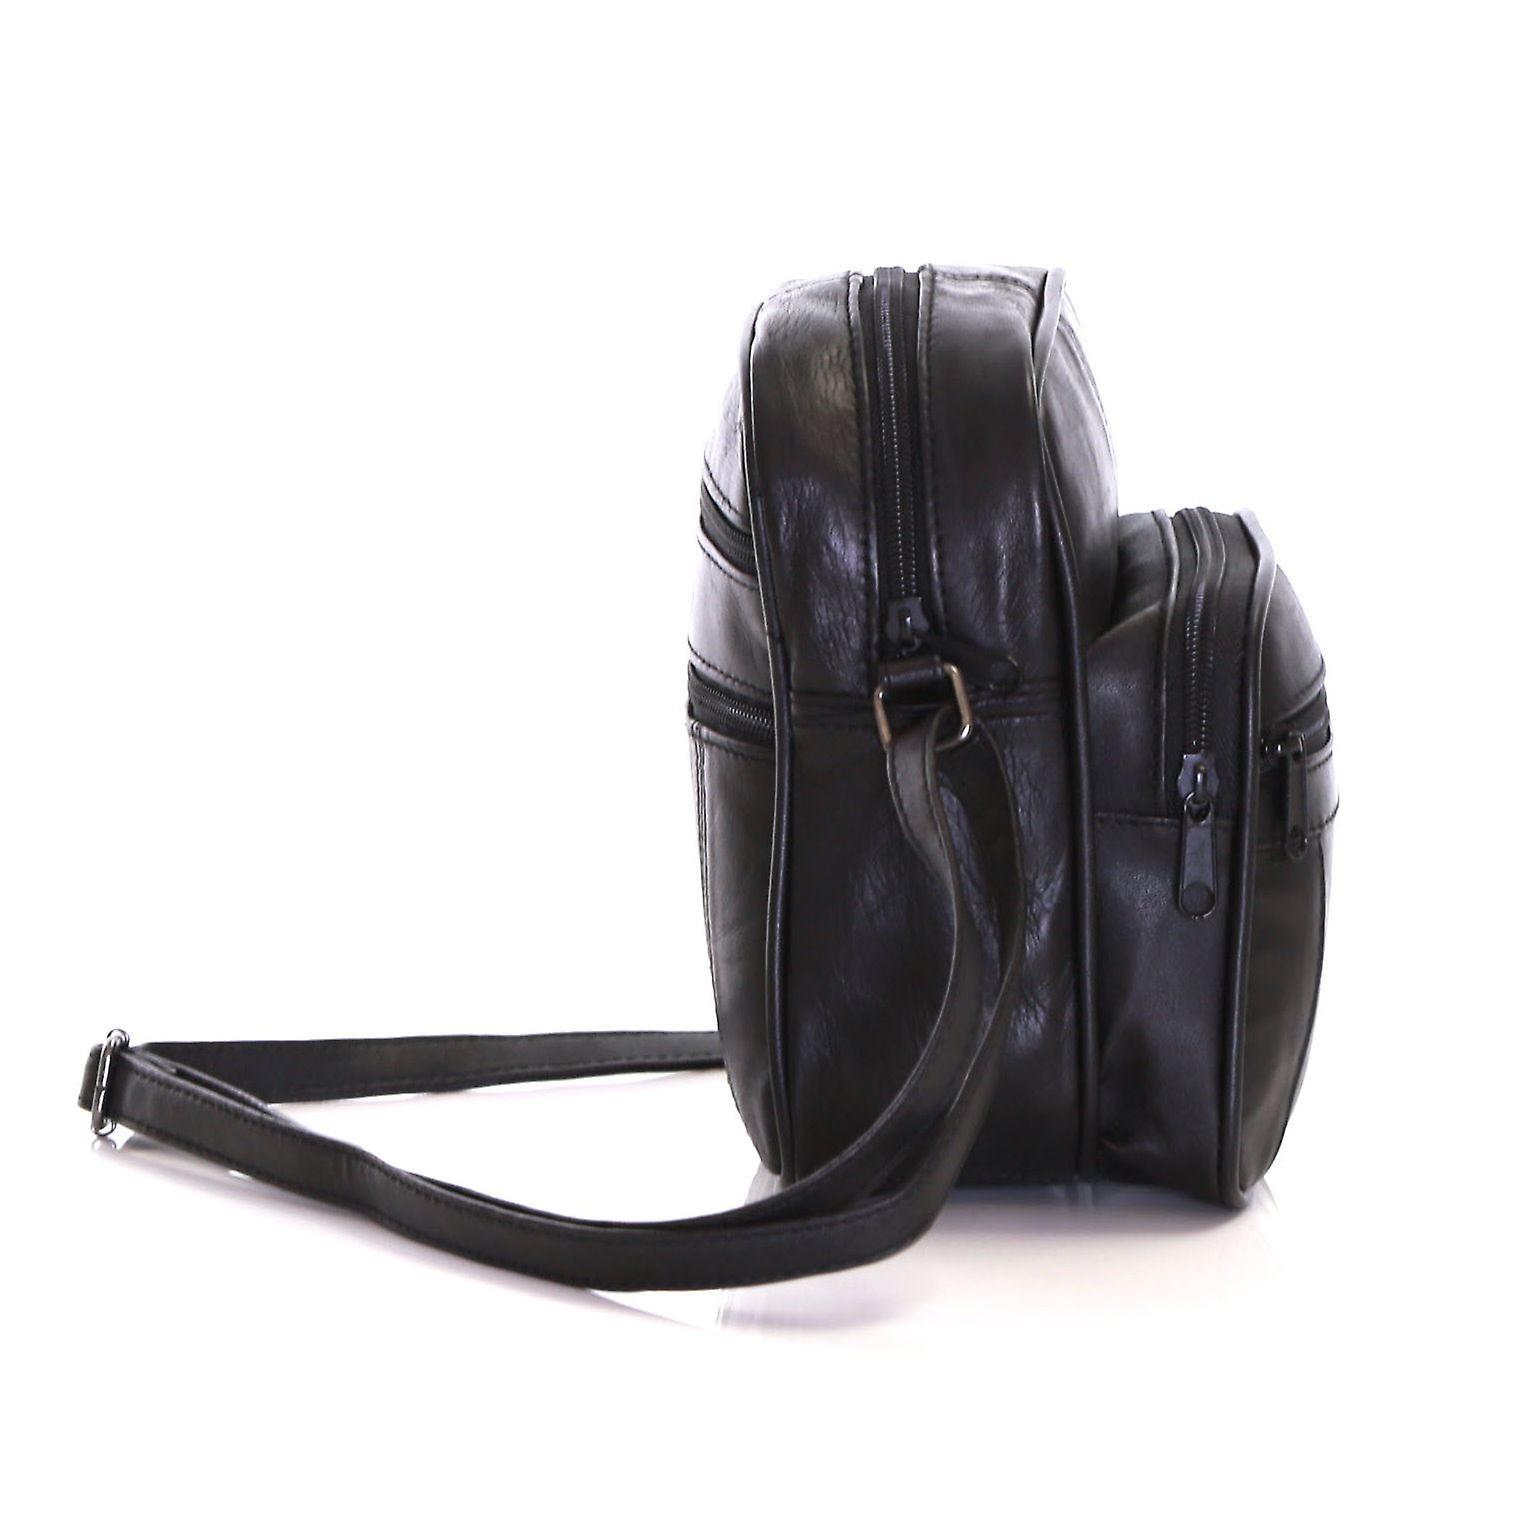 Slimbridge Mengen Small Leather Travel Bag, Black